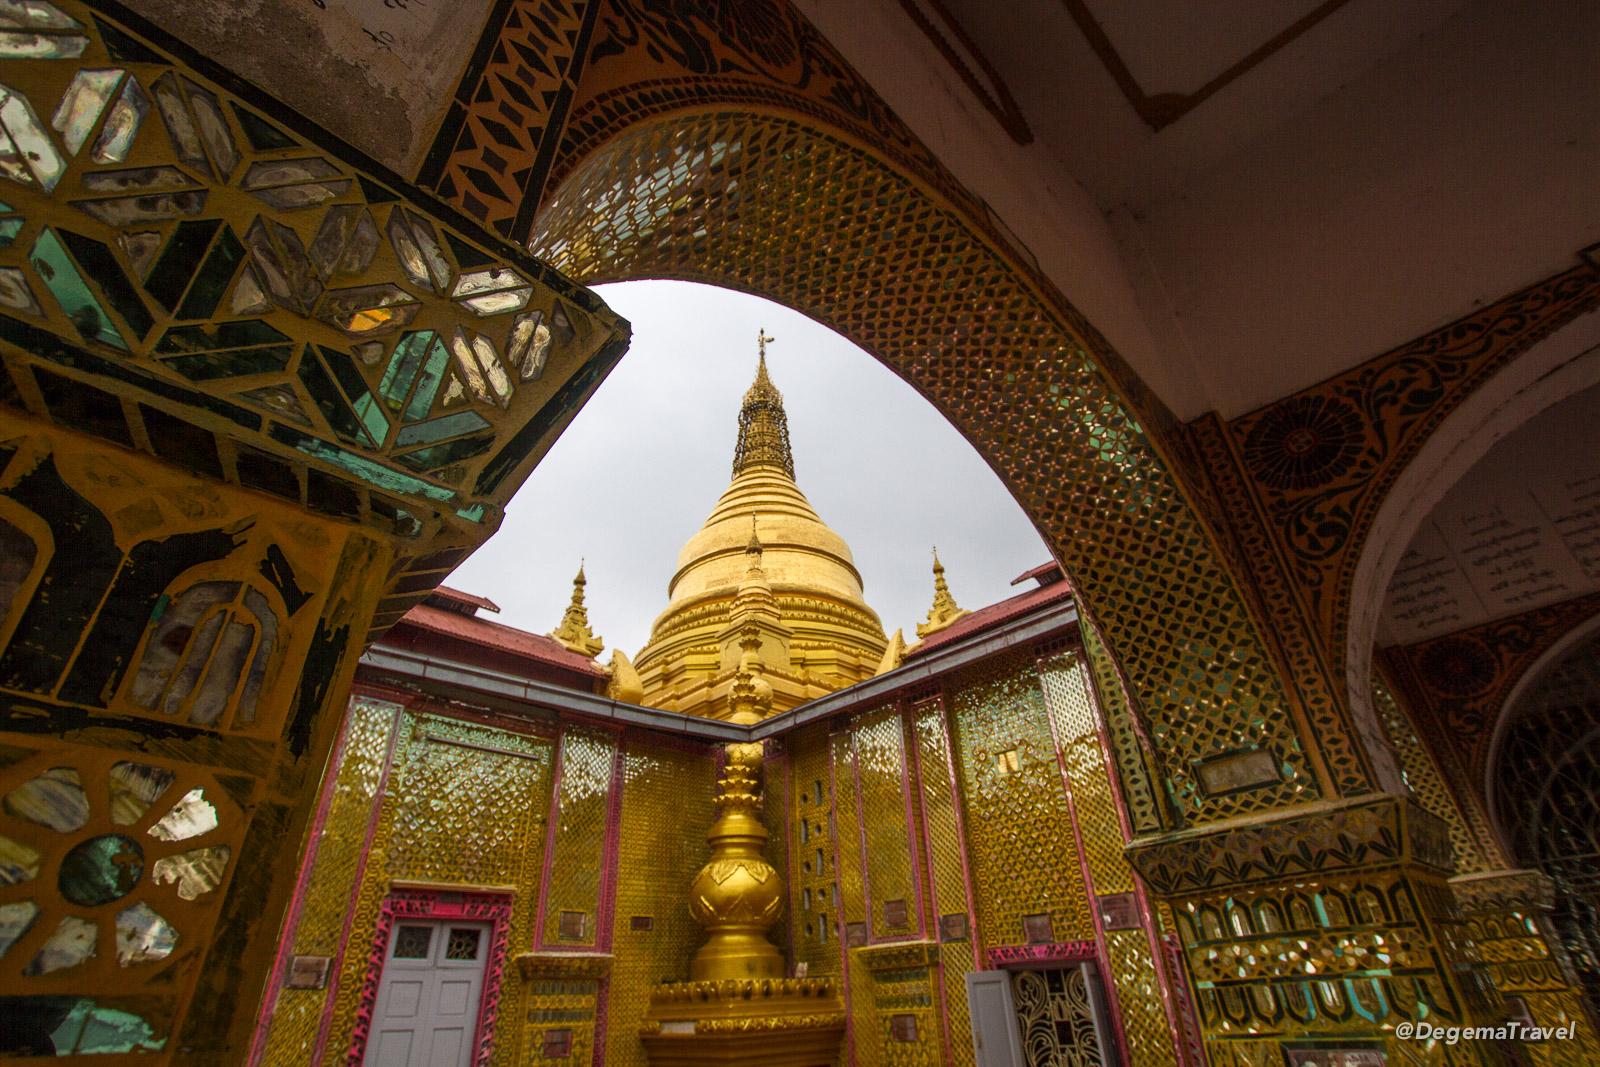 Sutaungpyae Paya in Mandalay, Myanmar